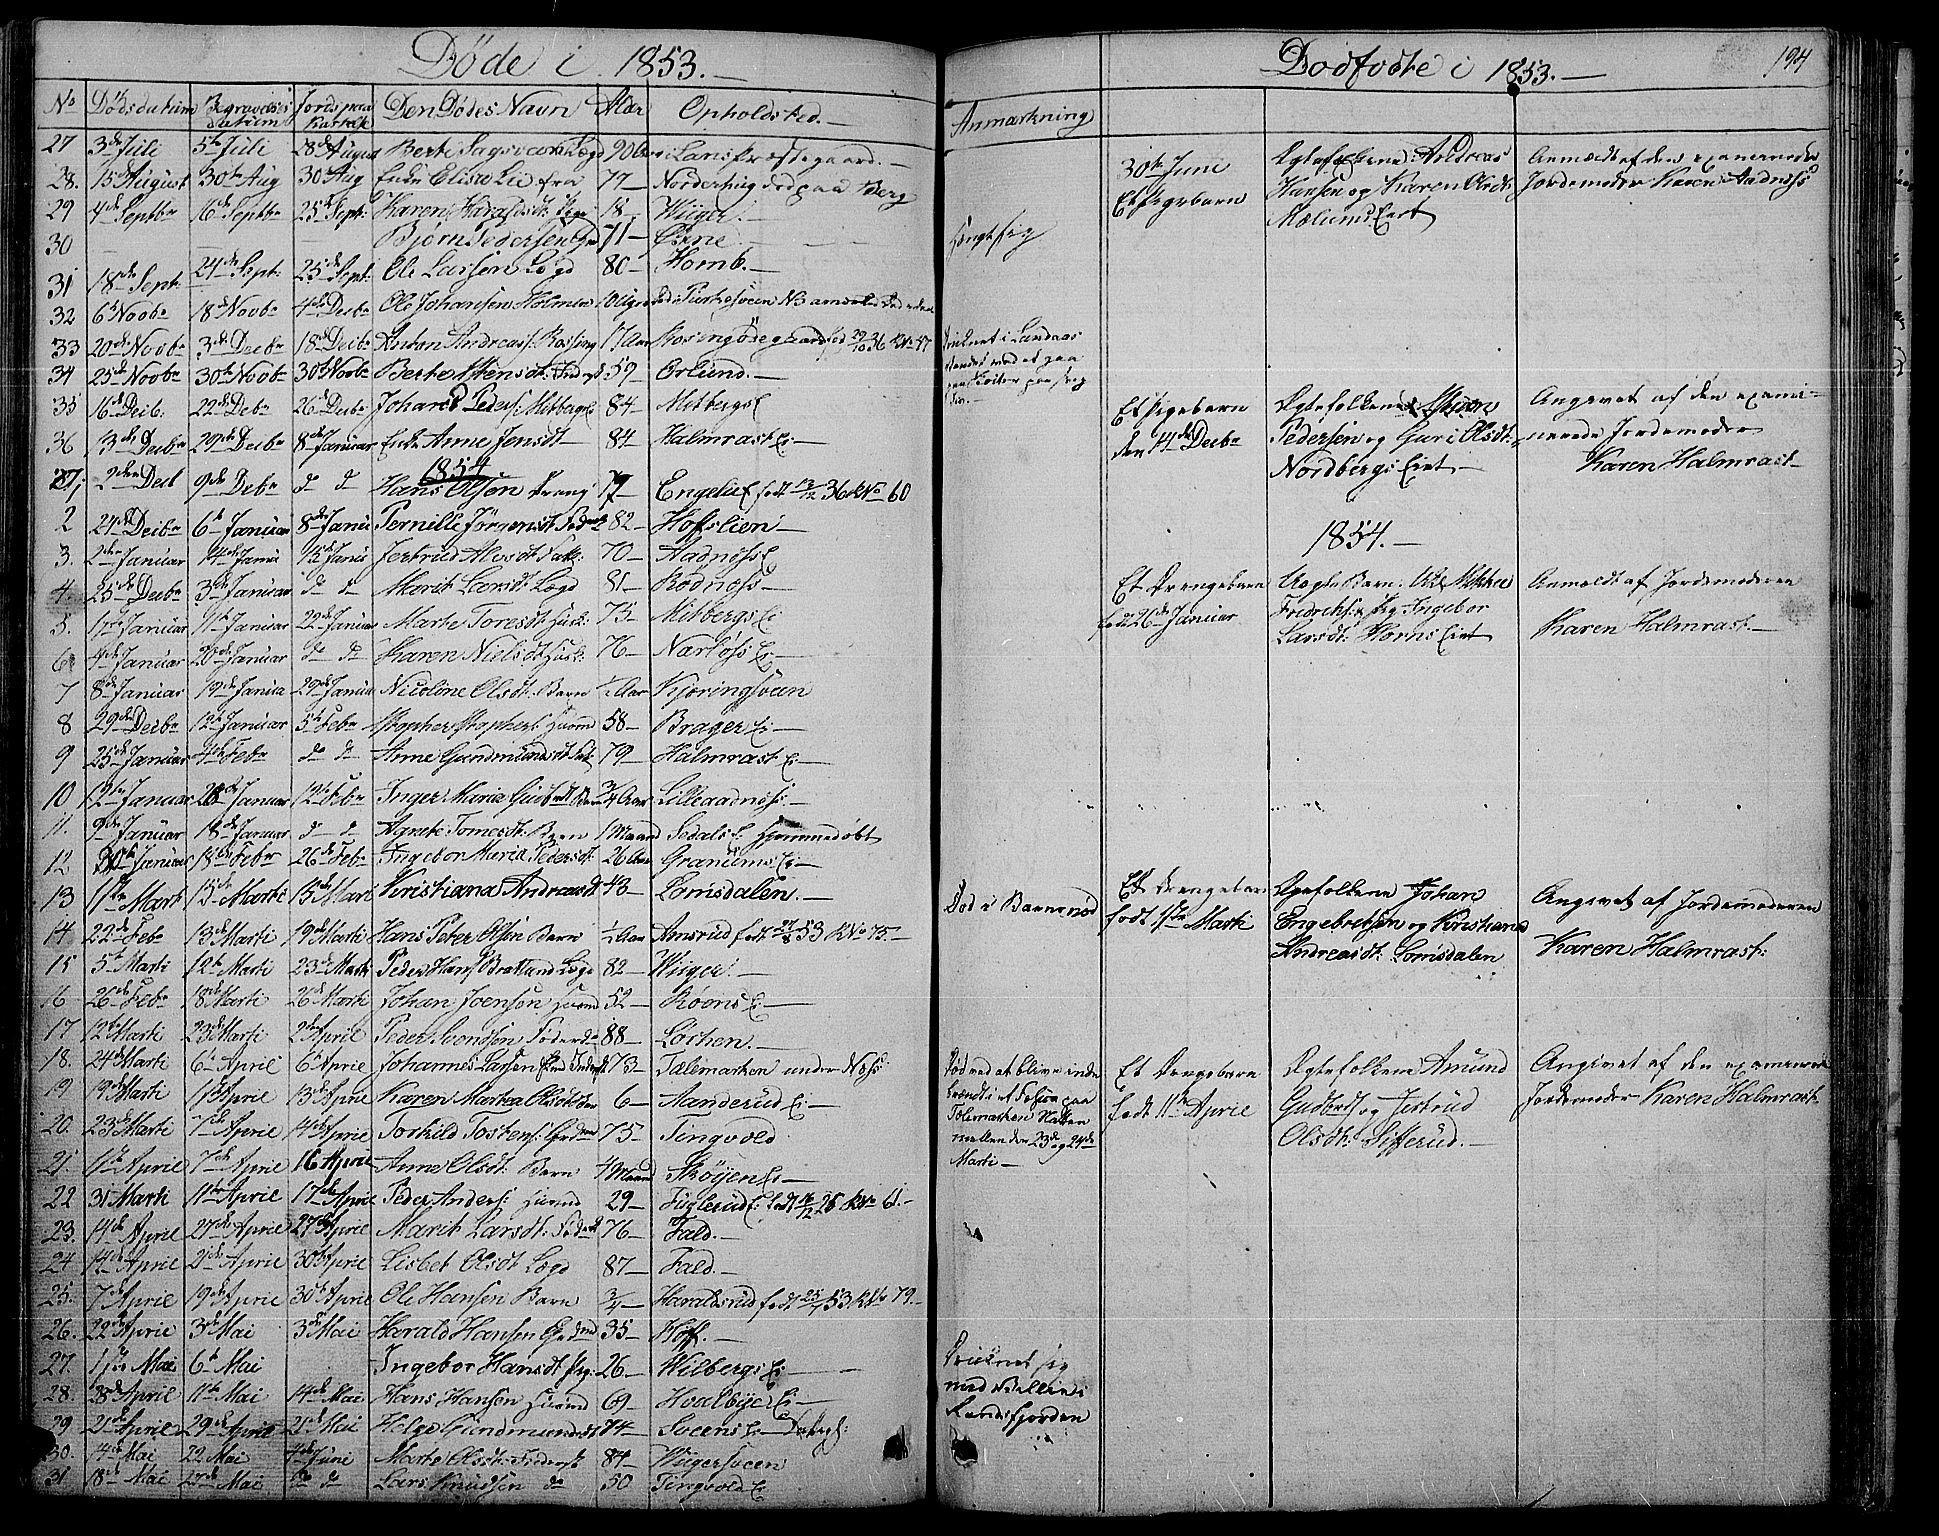 SAH, Søndre Land prestekontor, L/L0001: Klokkerbok nr. 1, 1849-1883, s. 194